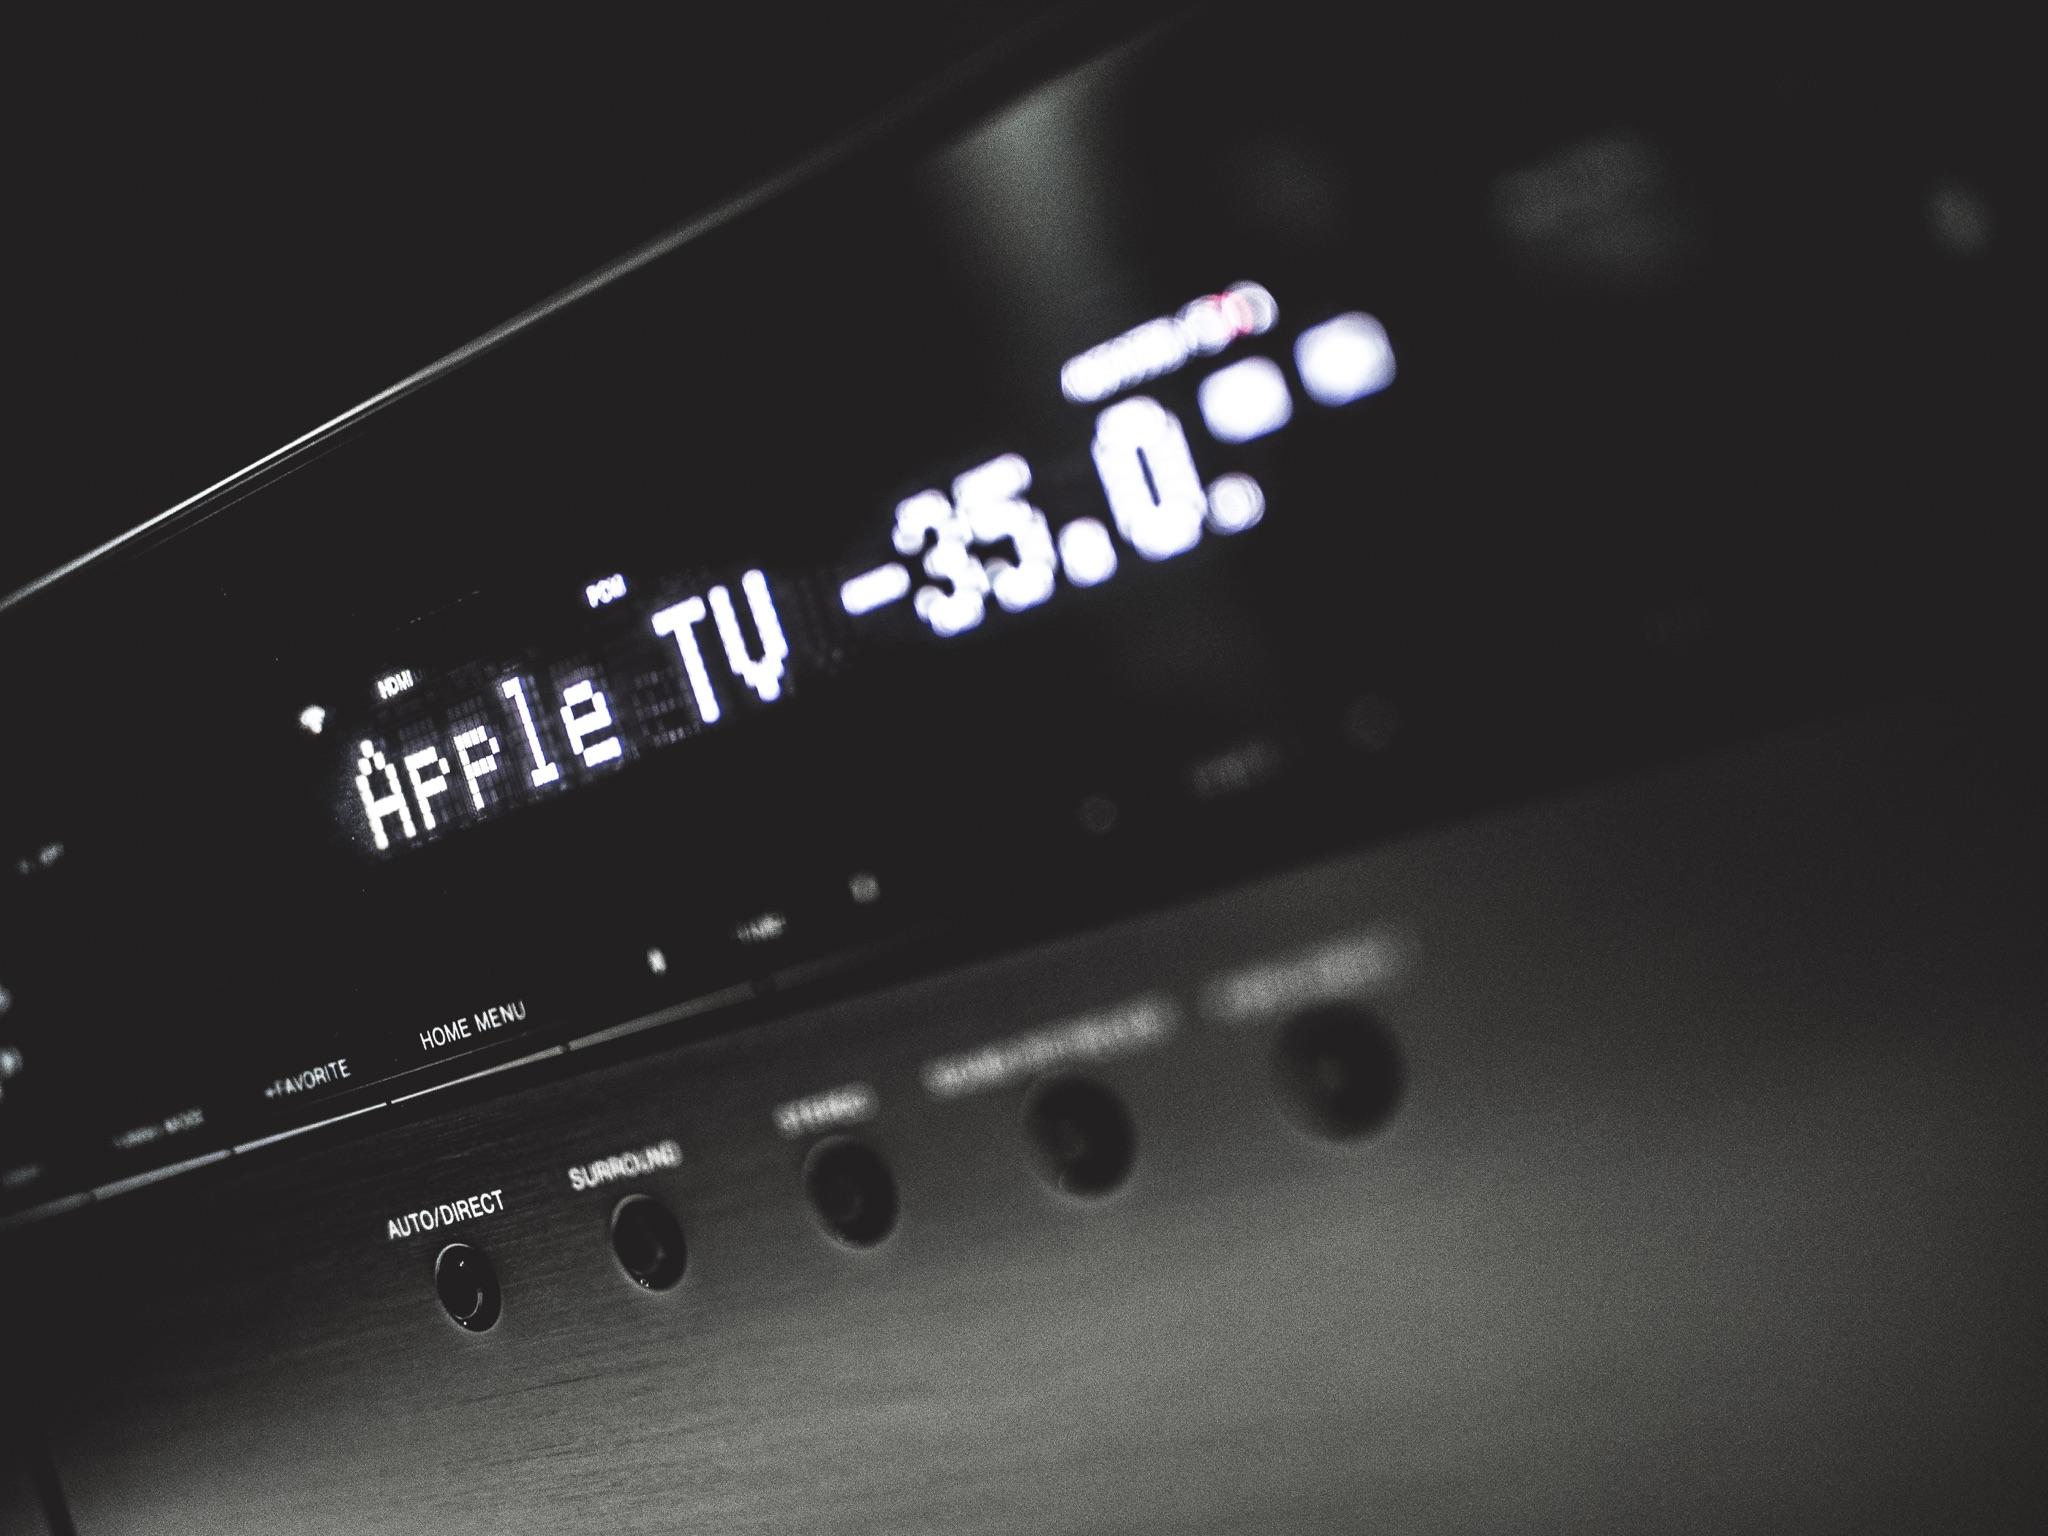 Home Cinema AV Surround Sound Pioneer VSX-932 Receiver Initial Setup Apple TV